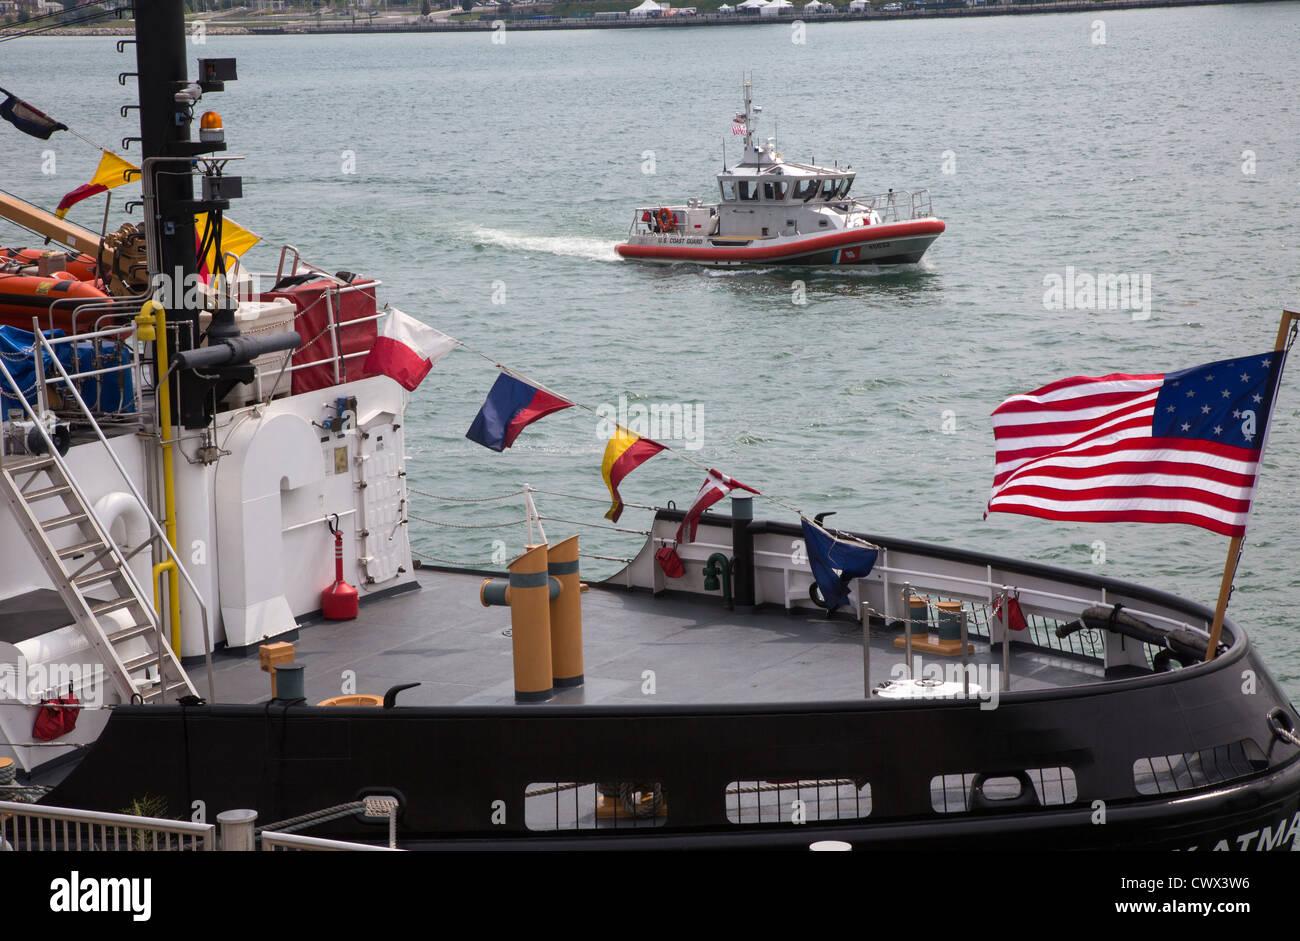 A small Coast Guard patrol boat passes the U.S. Coast Guard cutter Katmai Bay - Stock Image